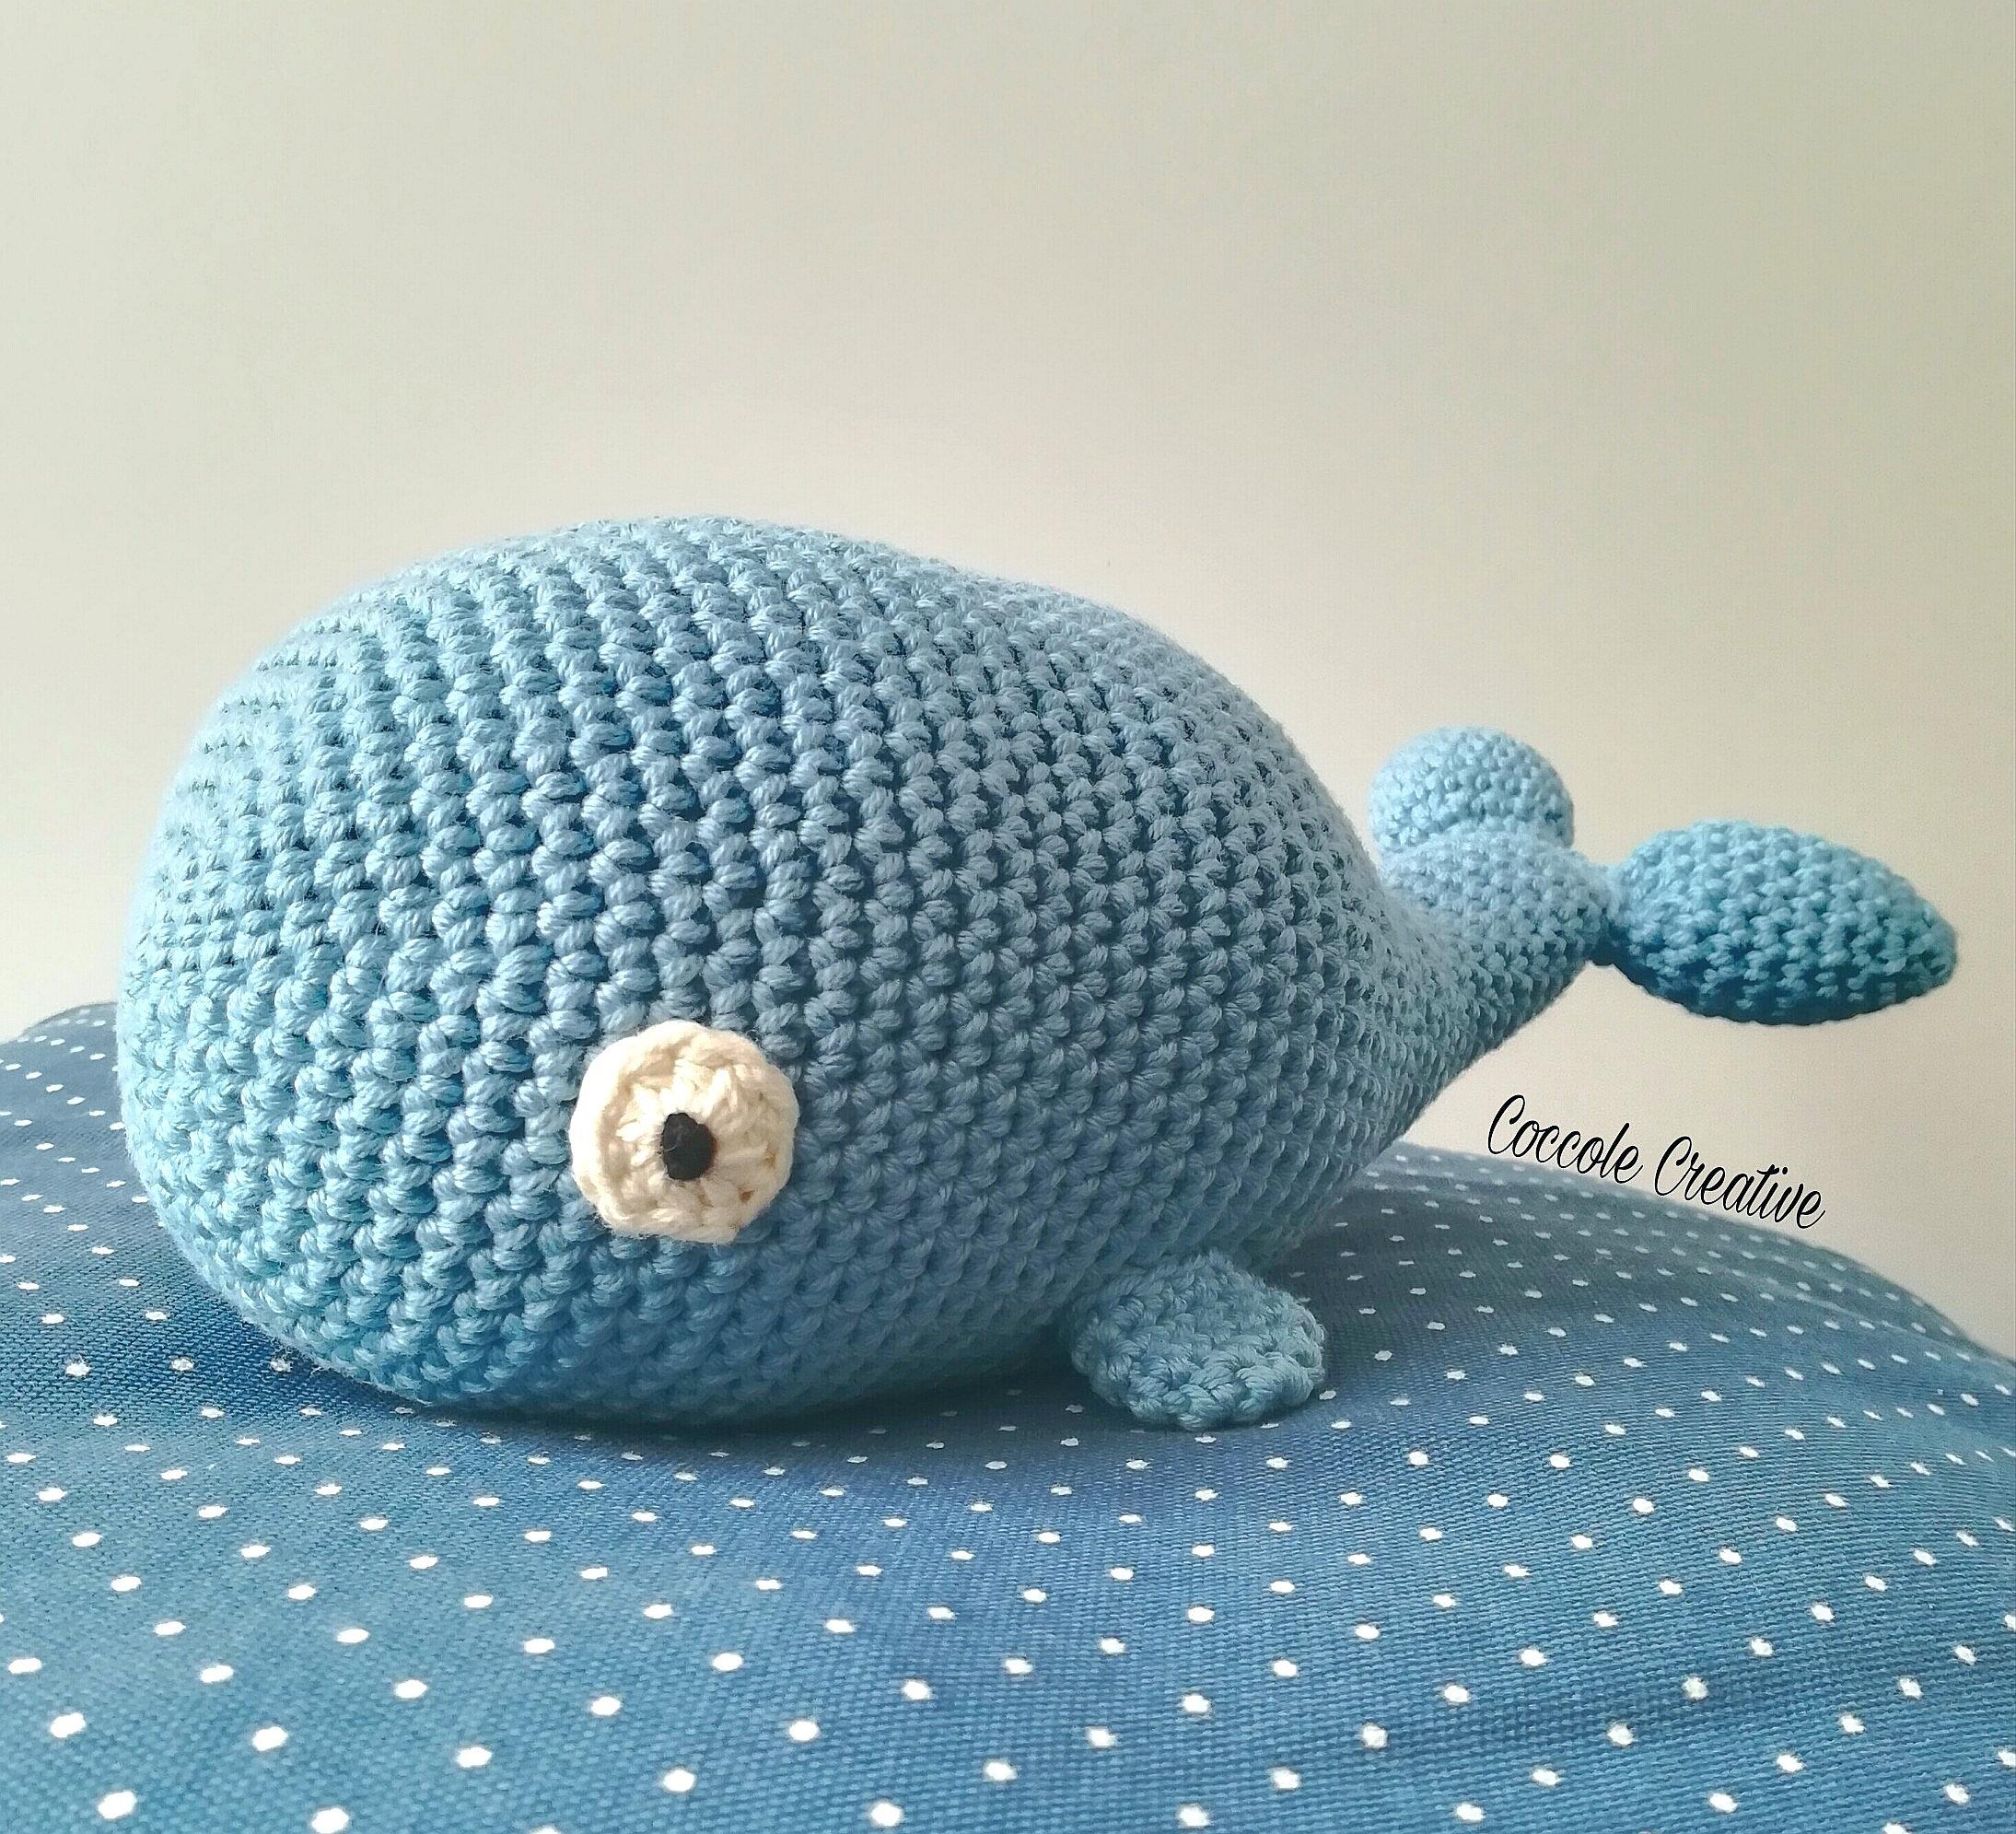 Crochet Amigurumi My Little Blue Whale Free Pattern - Amigurumi ... | 1991x2189